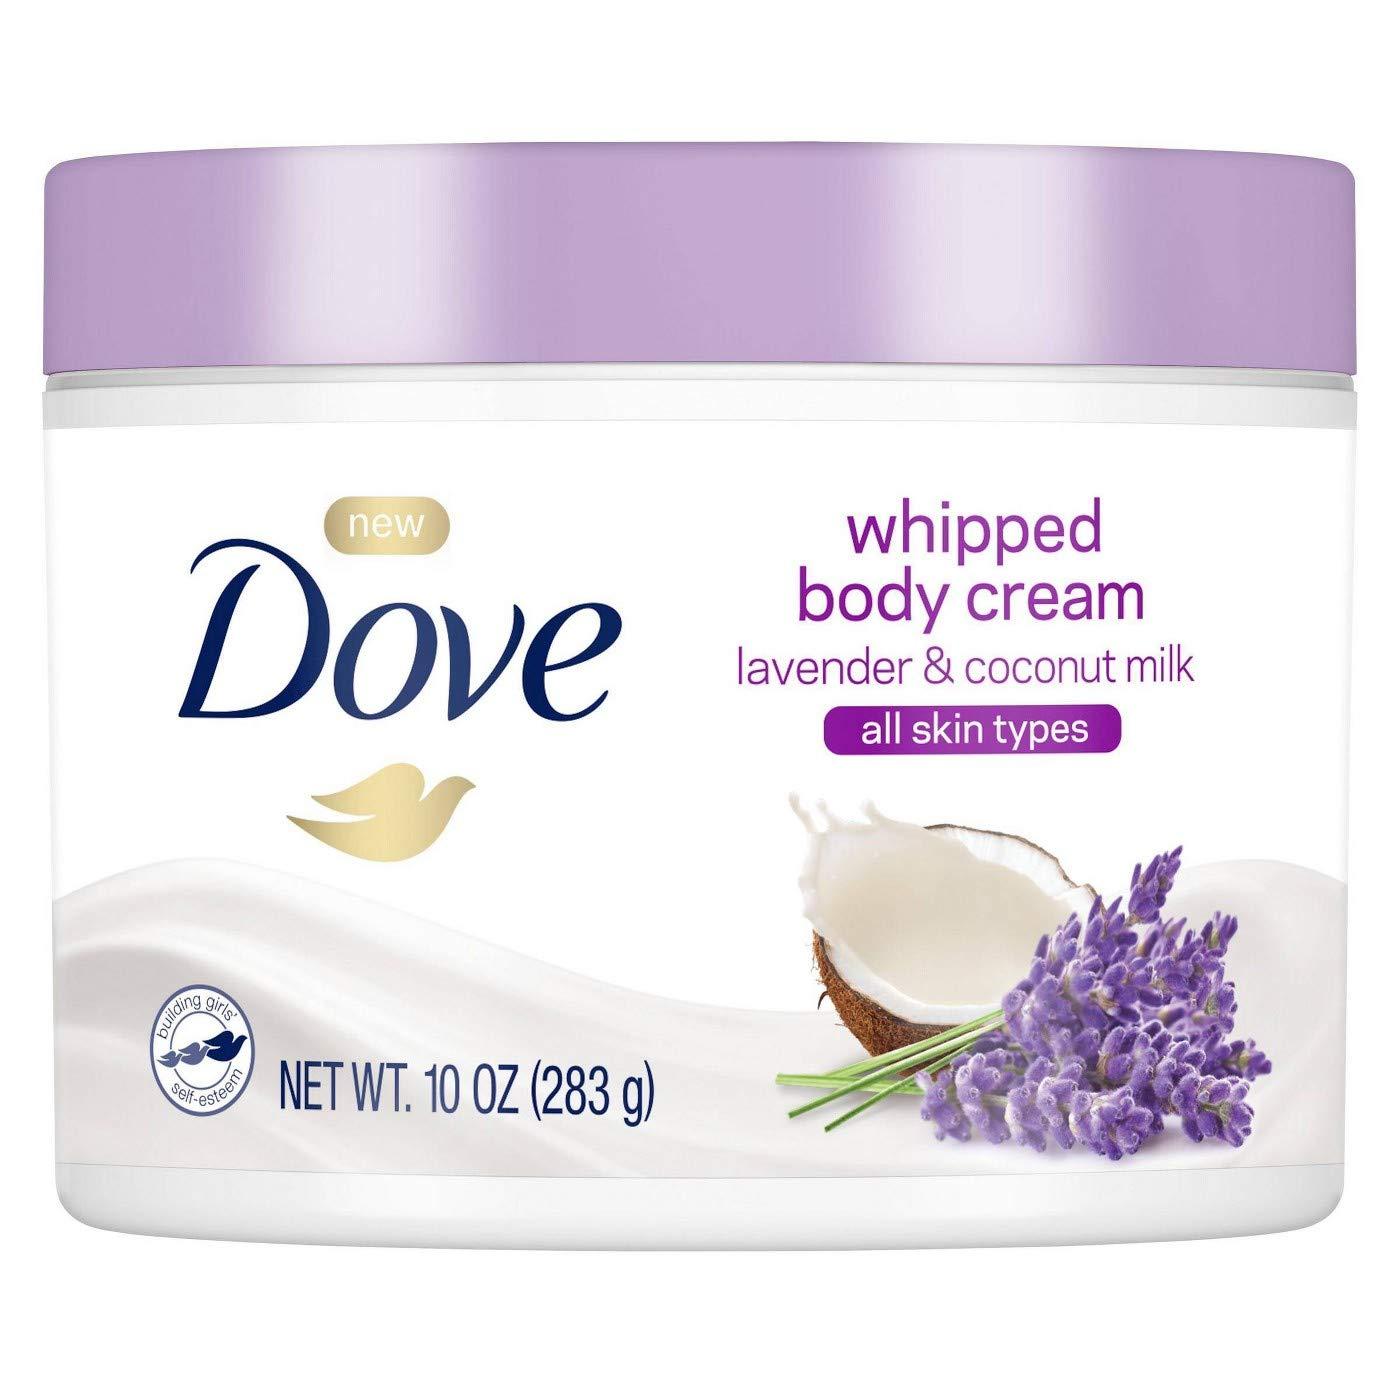 10oz. Dove Whipped Lavender and Coconut Milk Body Cream $4.07 5% or $3.64 15%